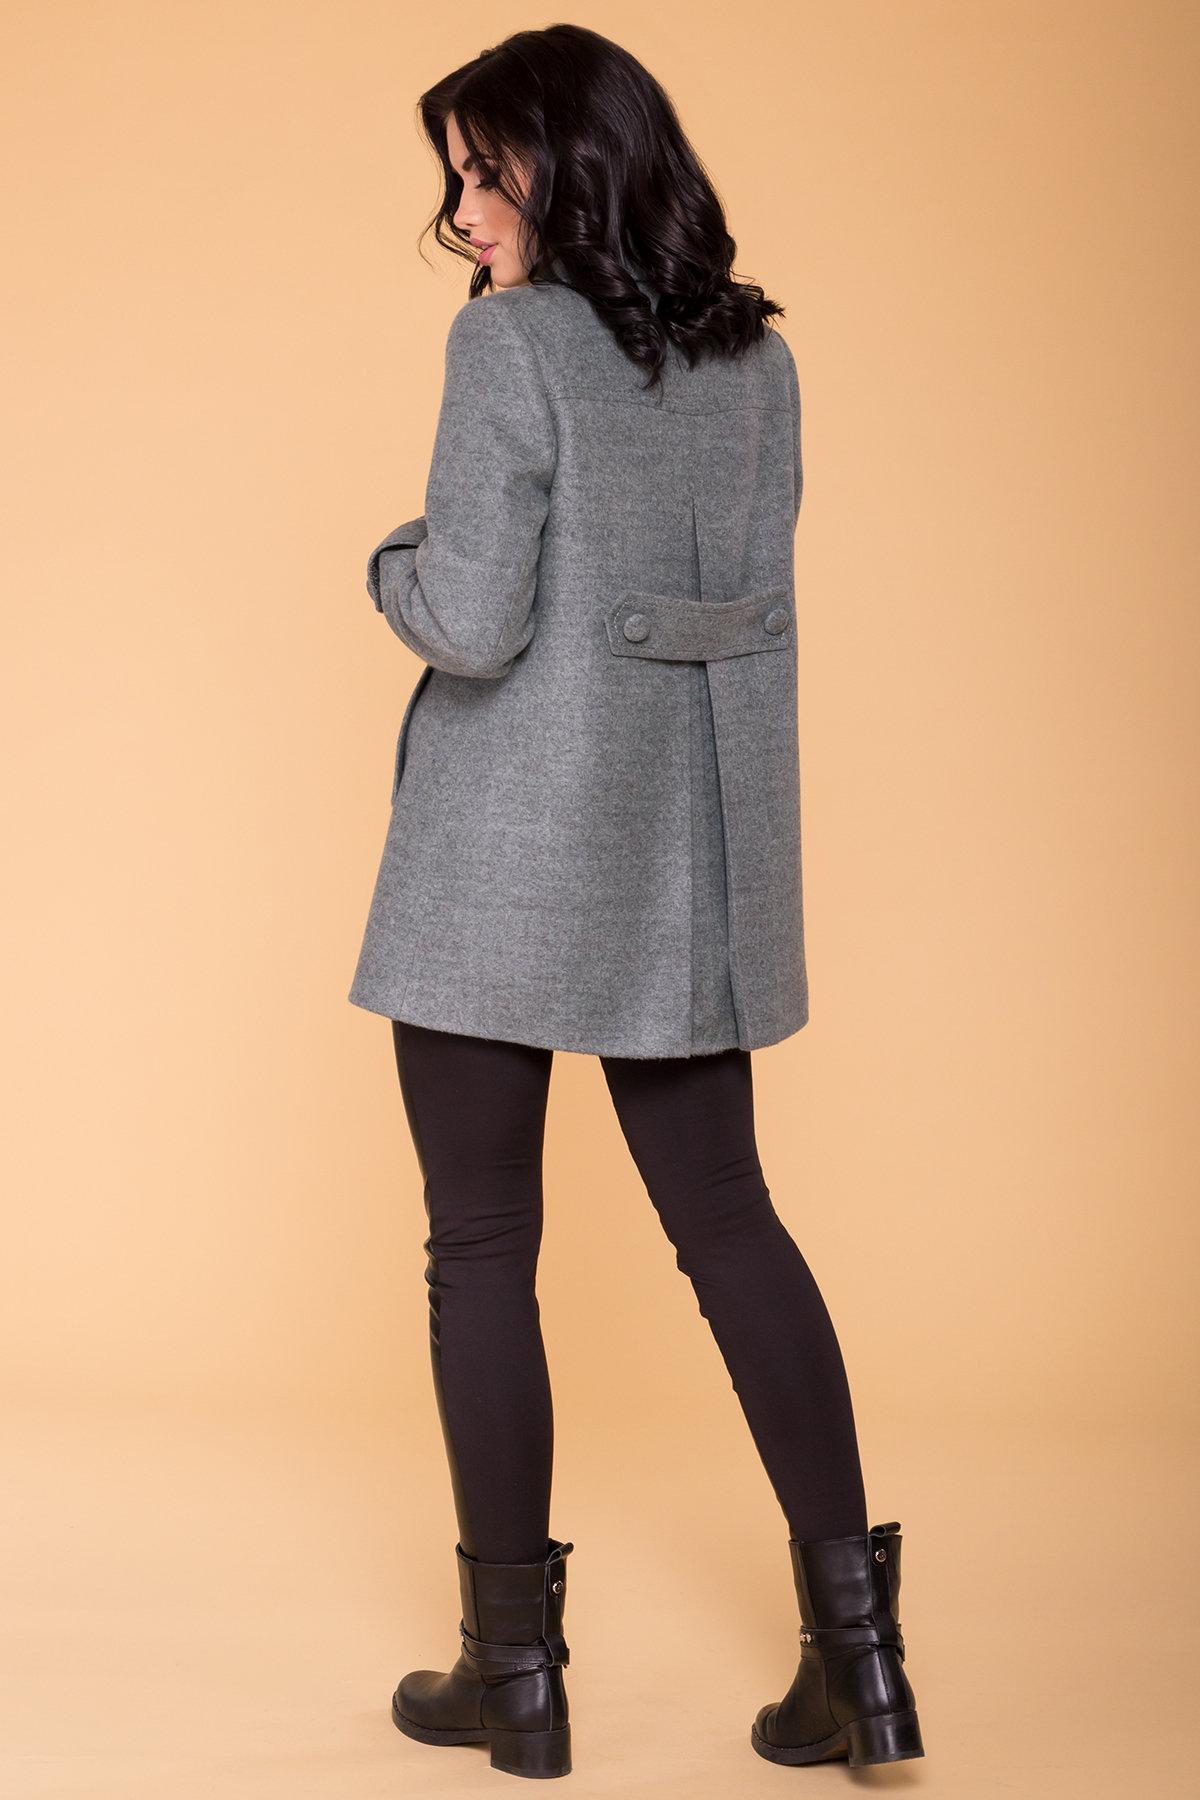 Пальто Нейт 6352 АРТ. 41182 Цвет: Олива - фото 2, интернет магазин tm-modus.ru